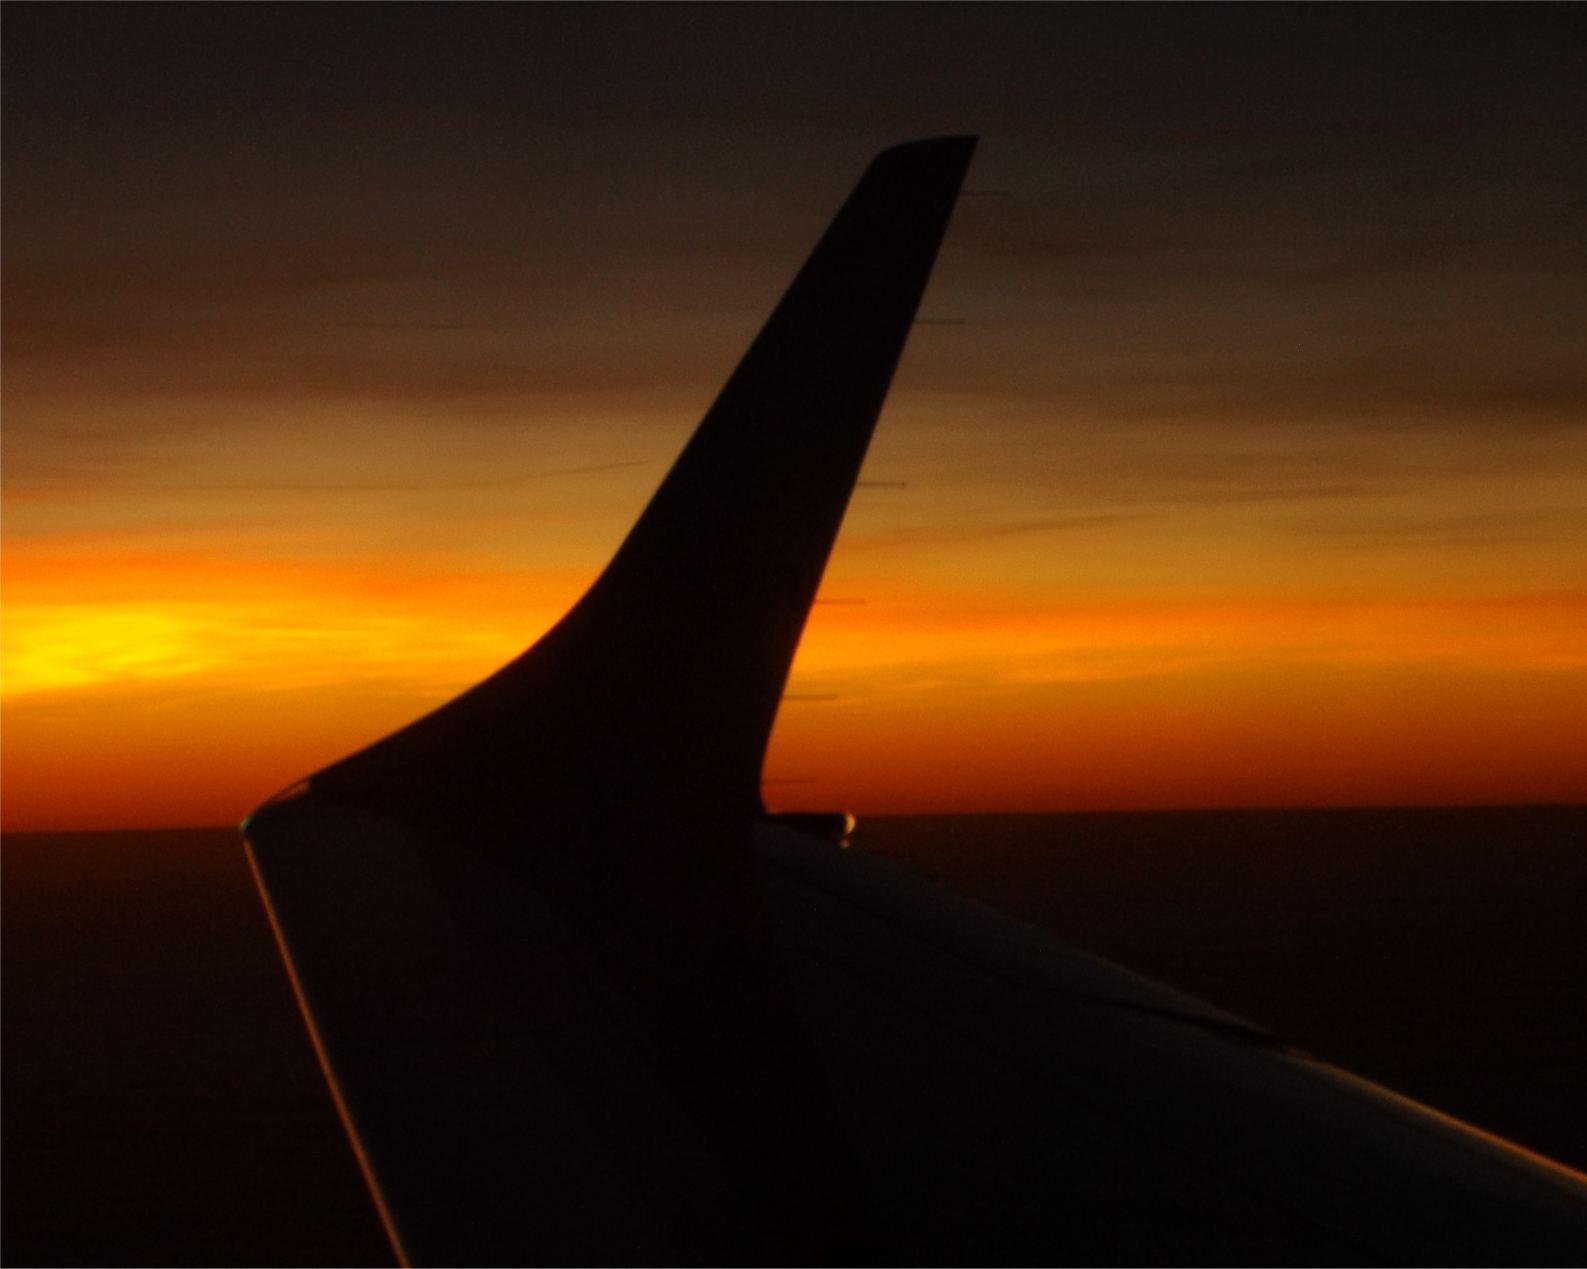 sunset-in-the-sky - reisefoto aus dem Flugzeug